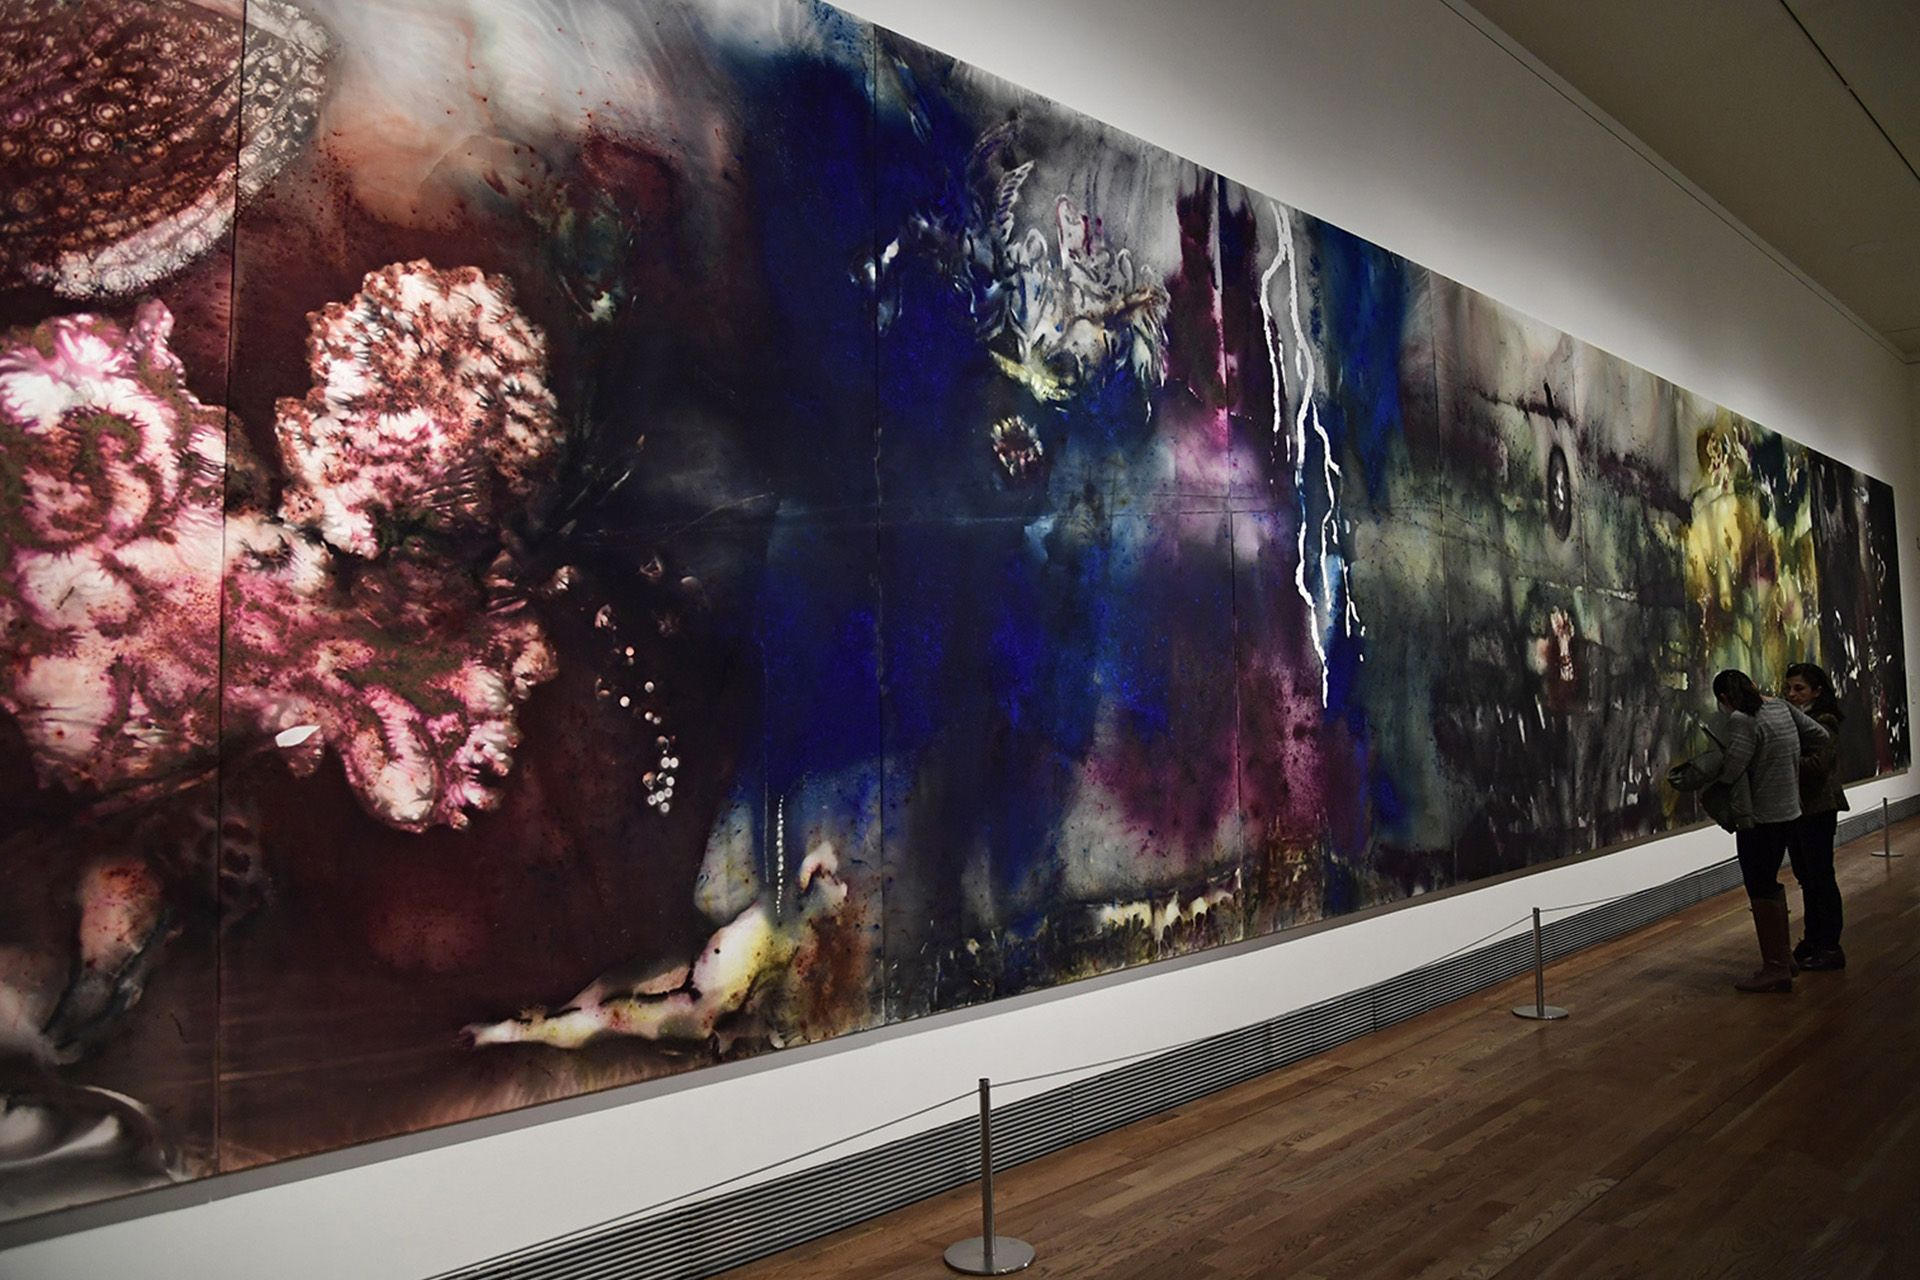 Gunpowder and explosive art as Prado museum hosts Cai Guo-Qiang